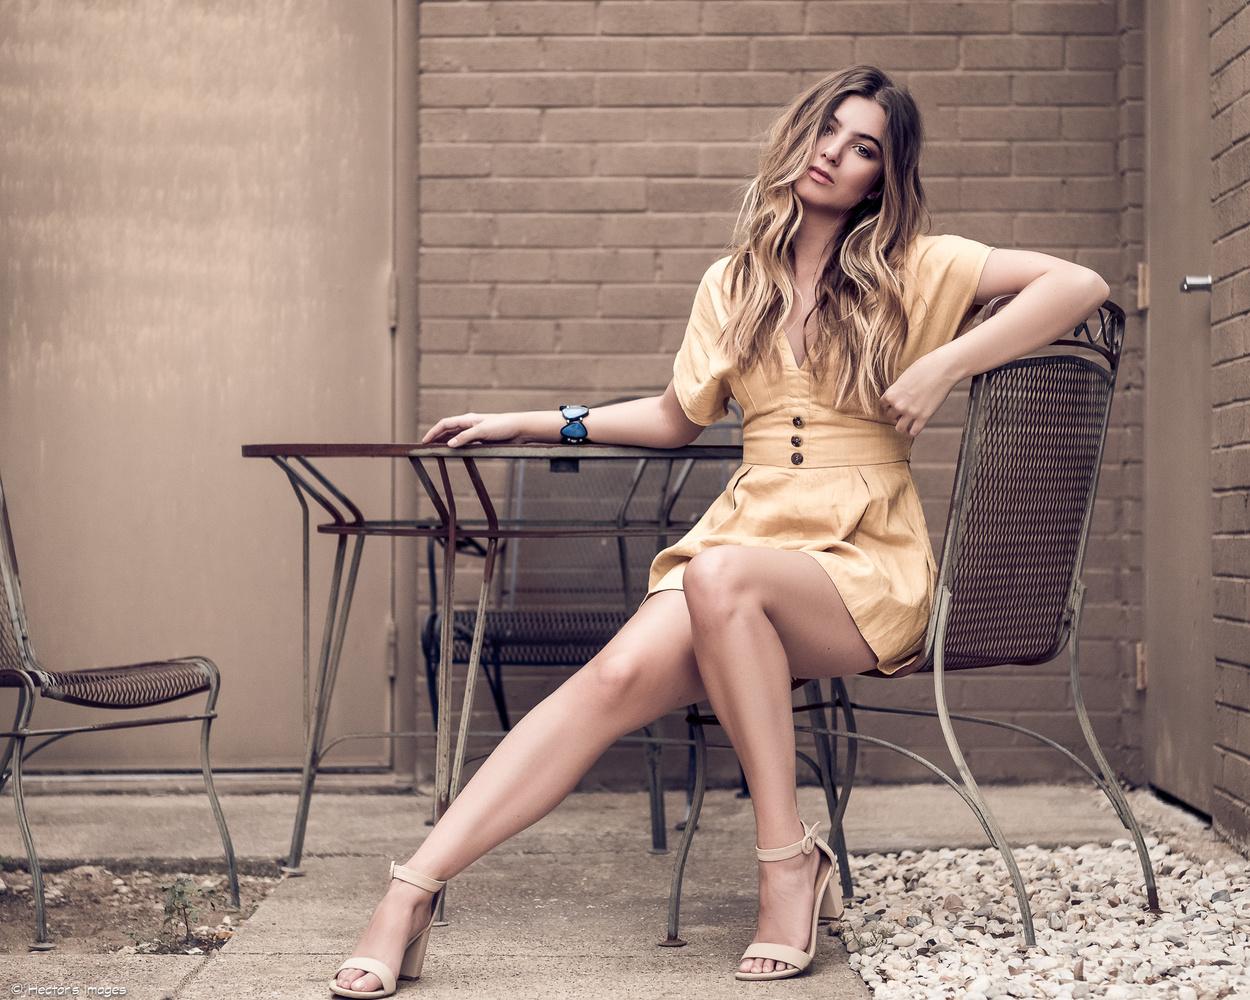 Lauren in a romper and heels by Hector Reyes